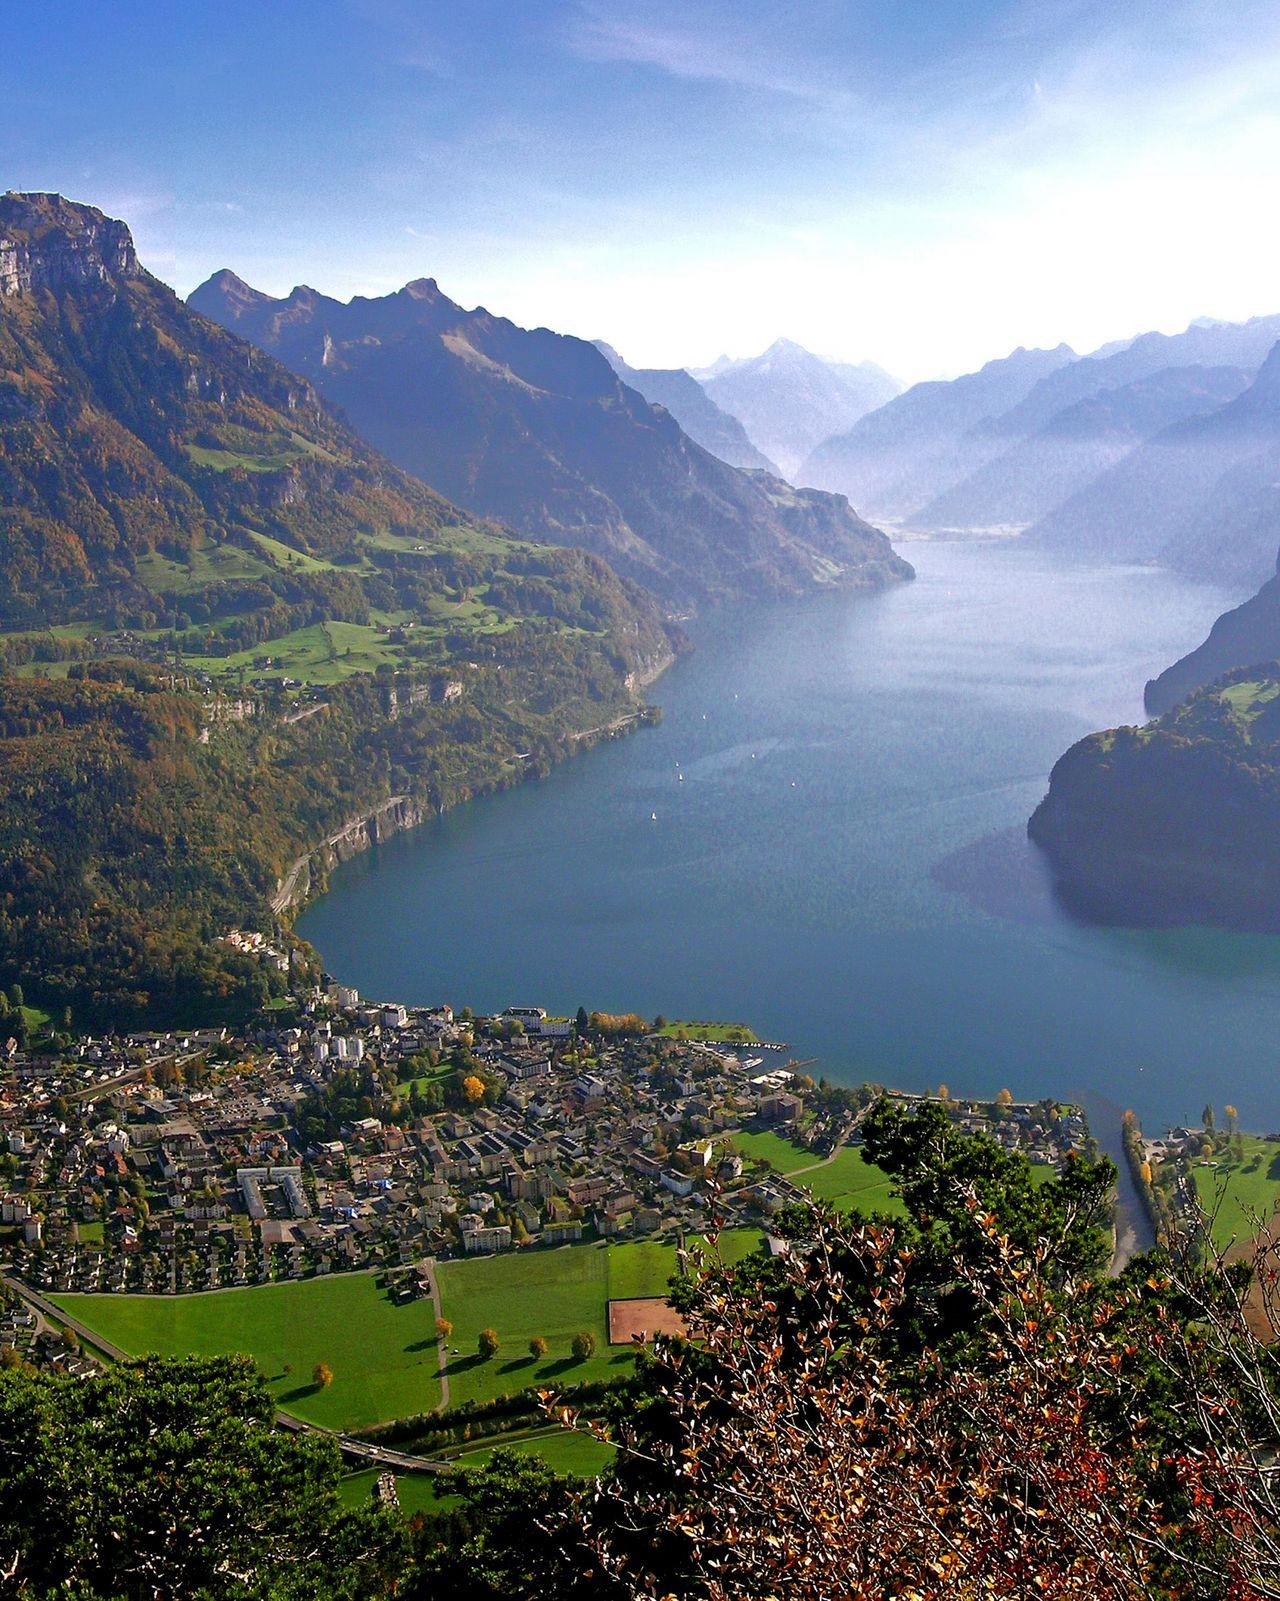 Guided village tour – Brunnen